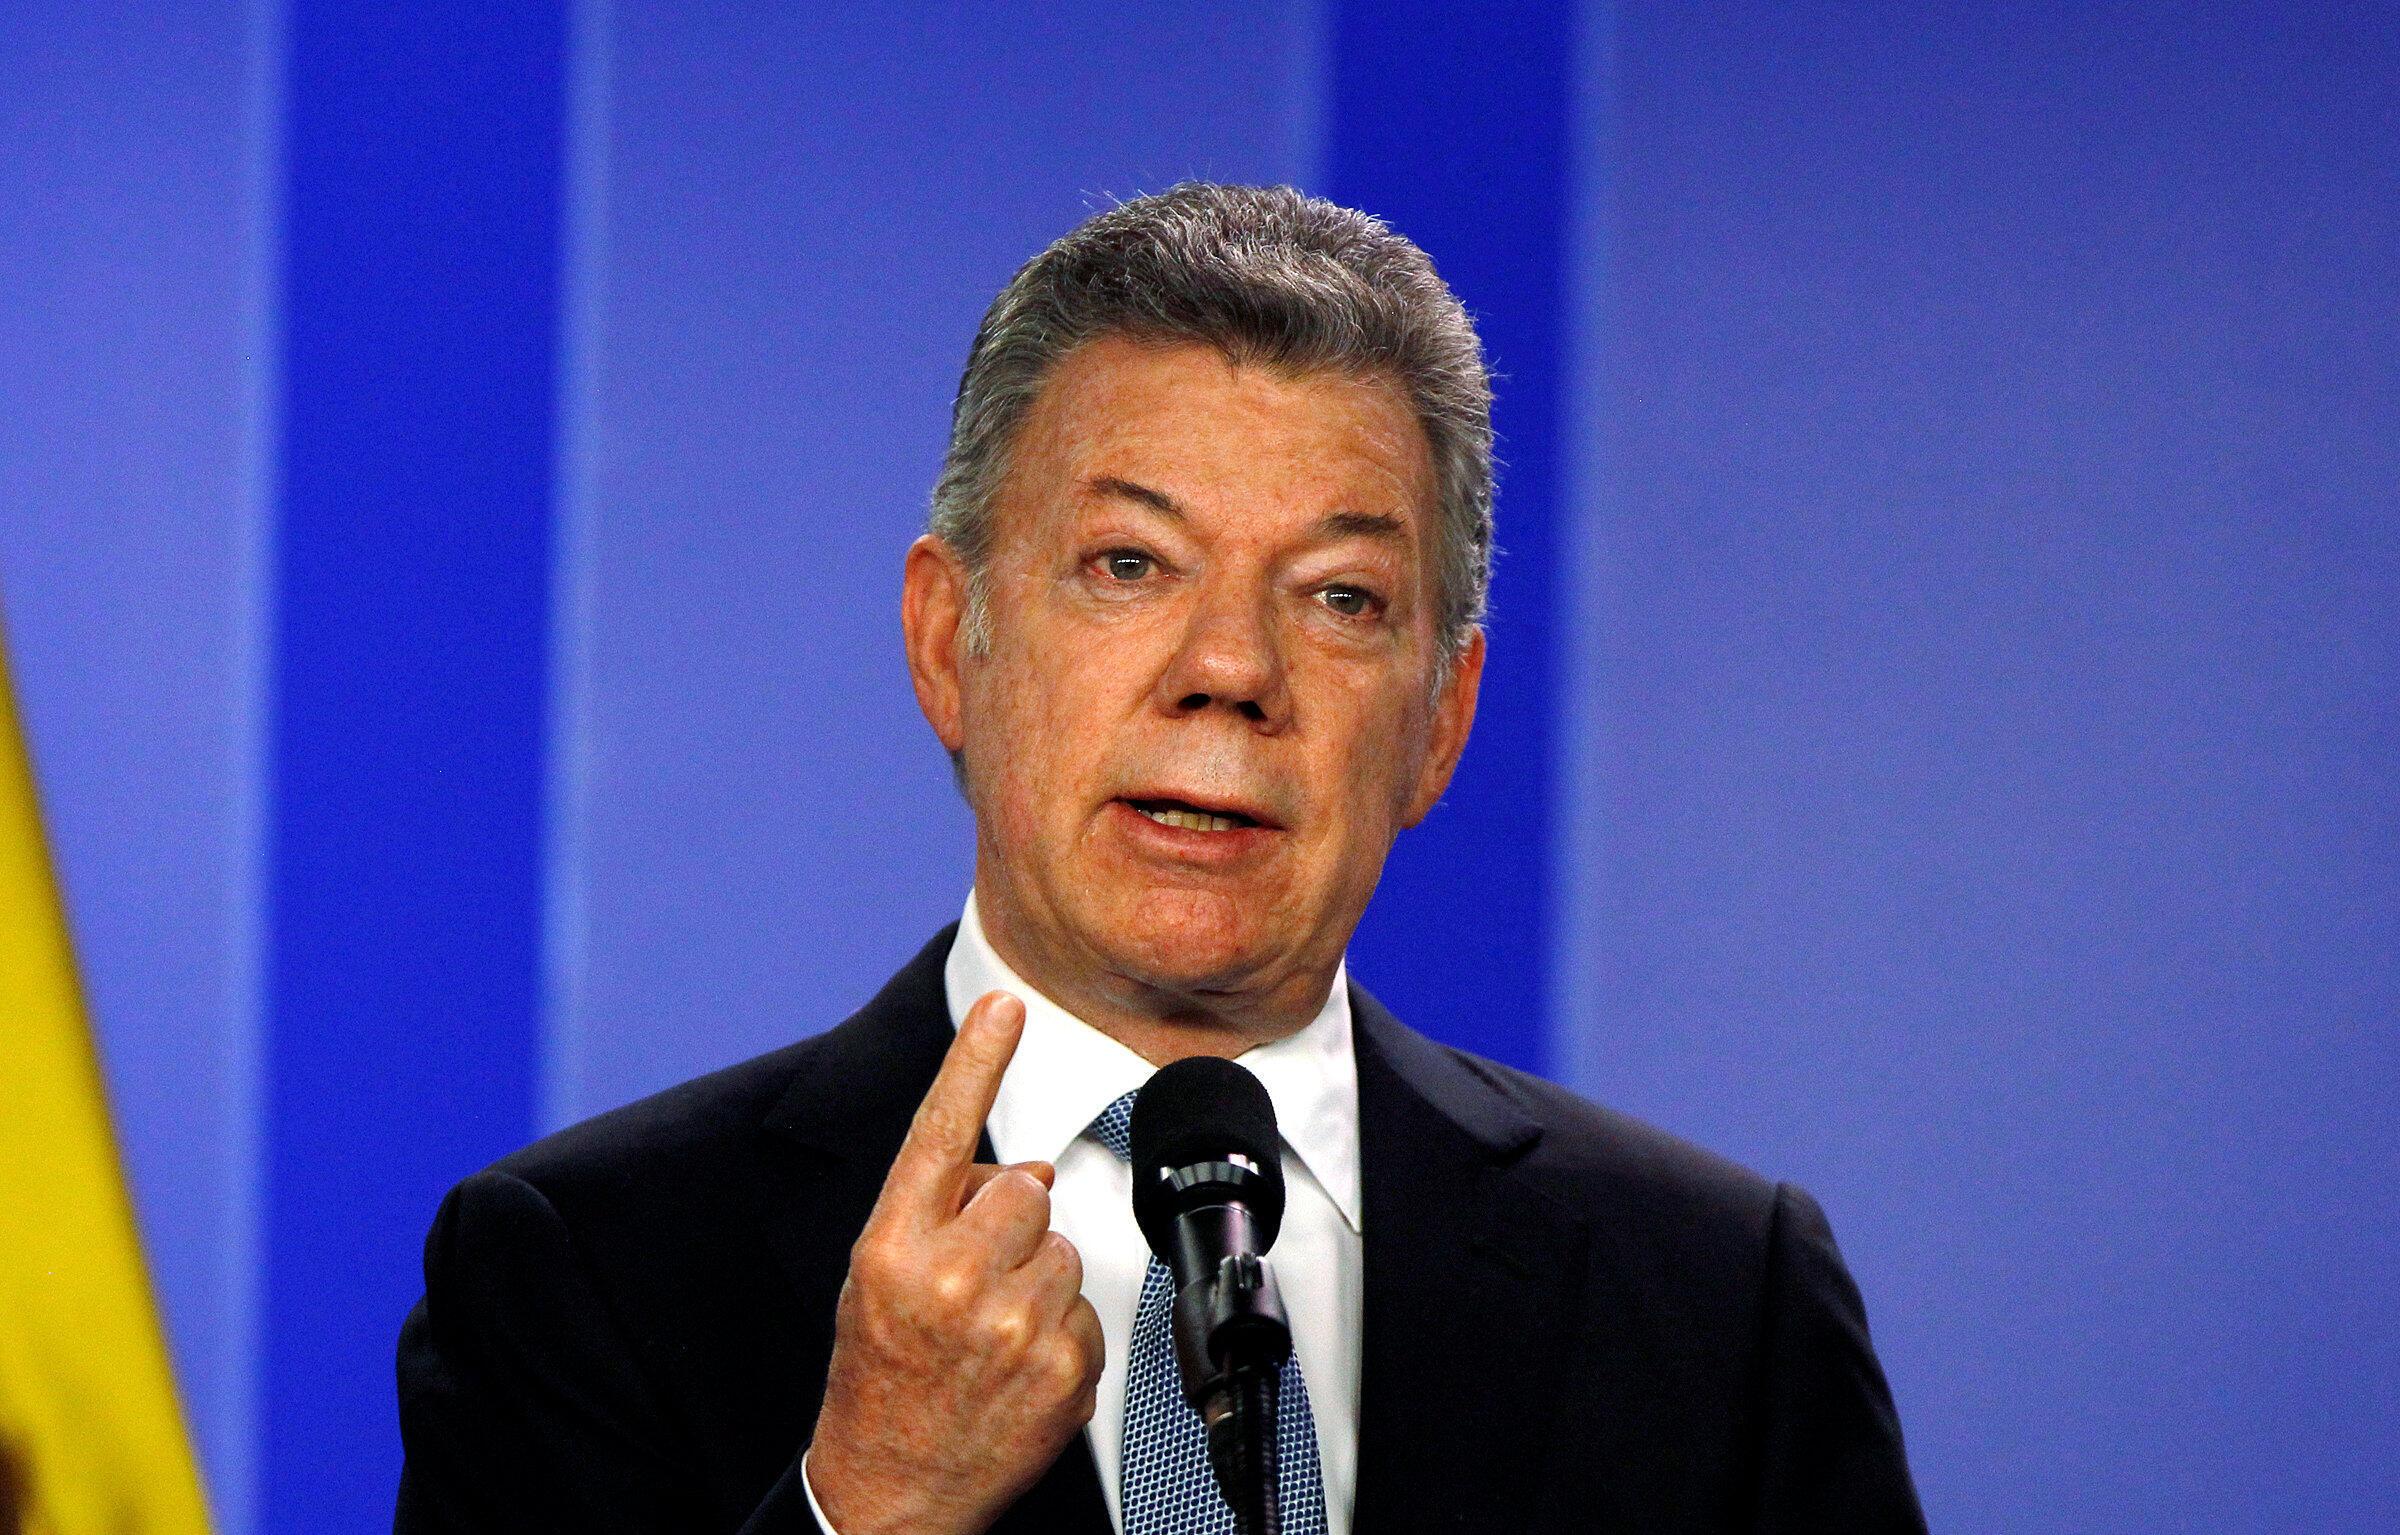 Colombia's outgoing President Juan Manual Santos